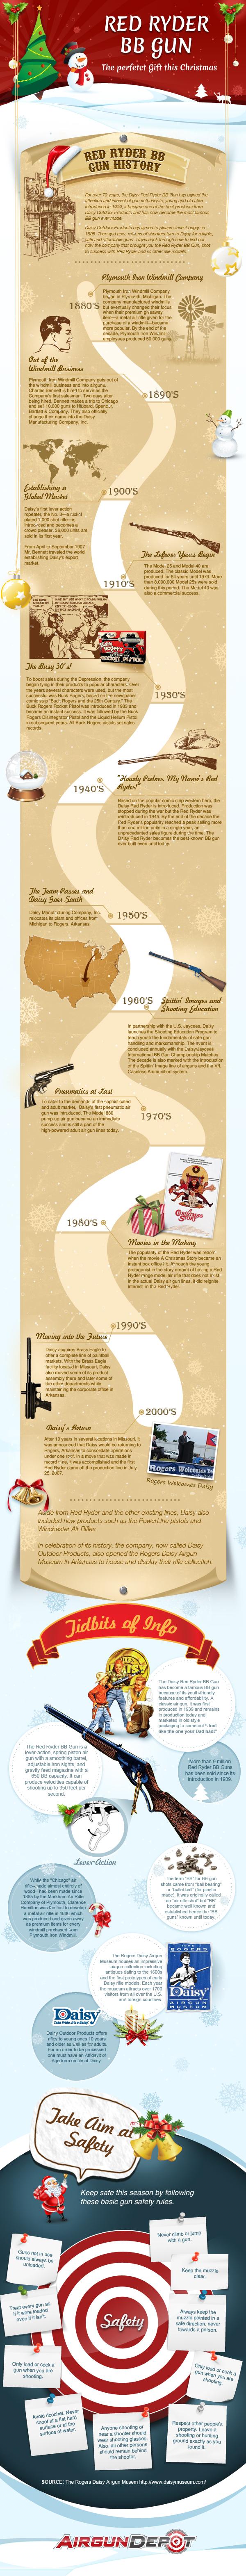 Daisy Red Ryder BB Gun History